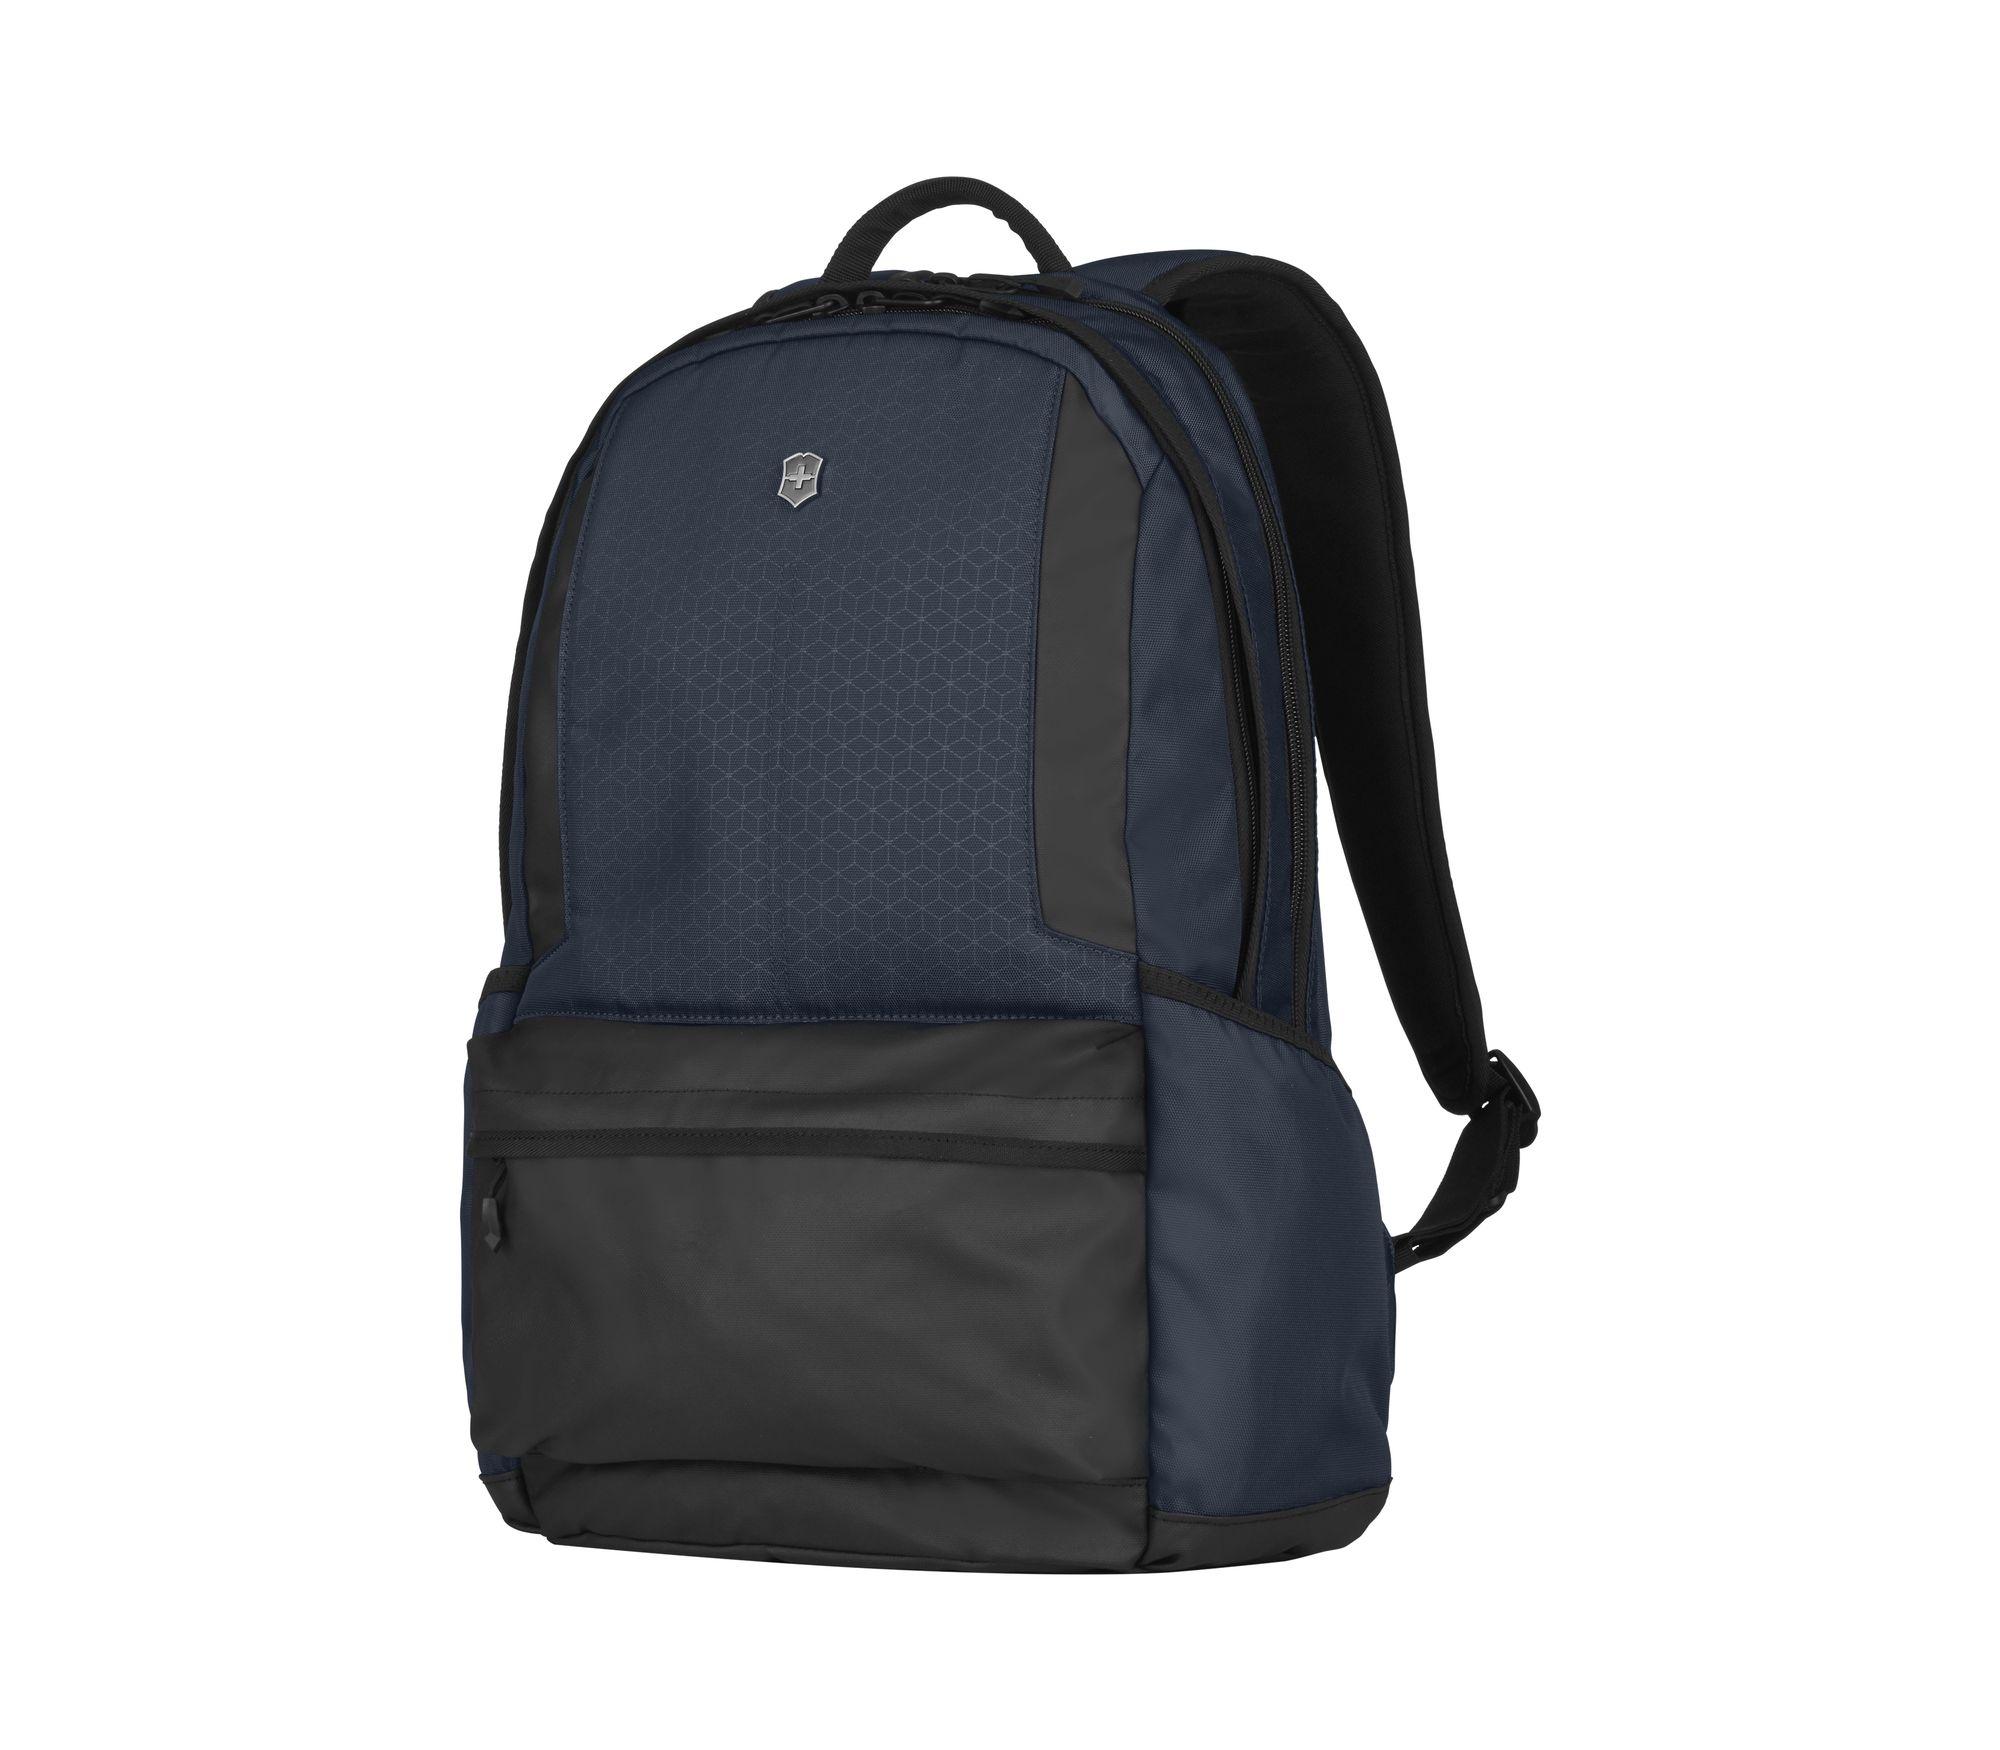 VICTORINOX 瑞士維氏 後背包 休閒後背包 電腦後背包 公事包 商務包 雙肩後背 TRGE-606743 (藍)